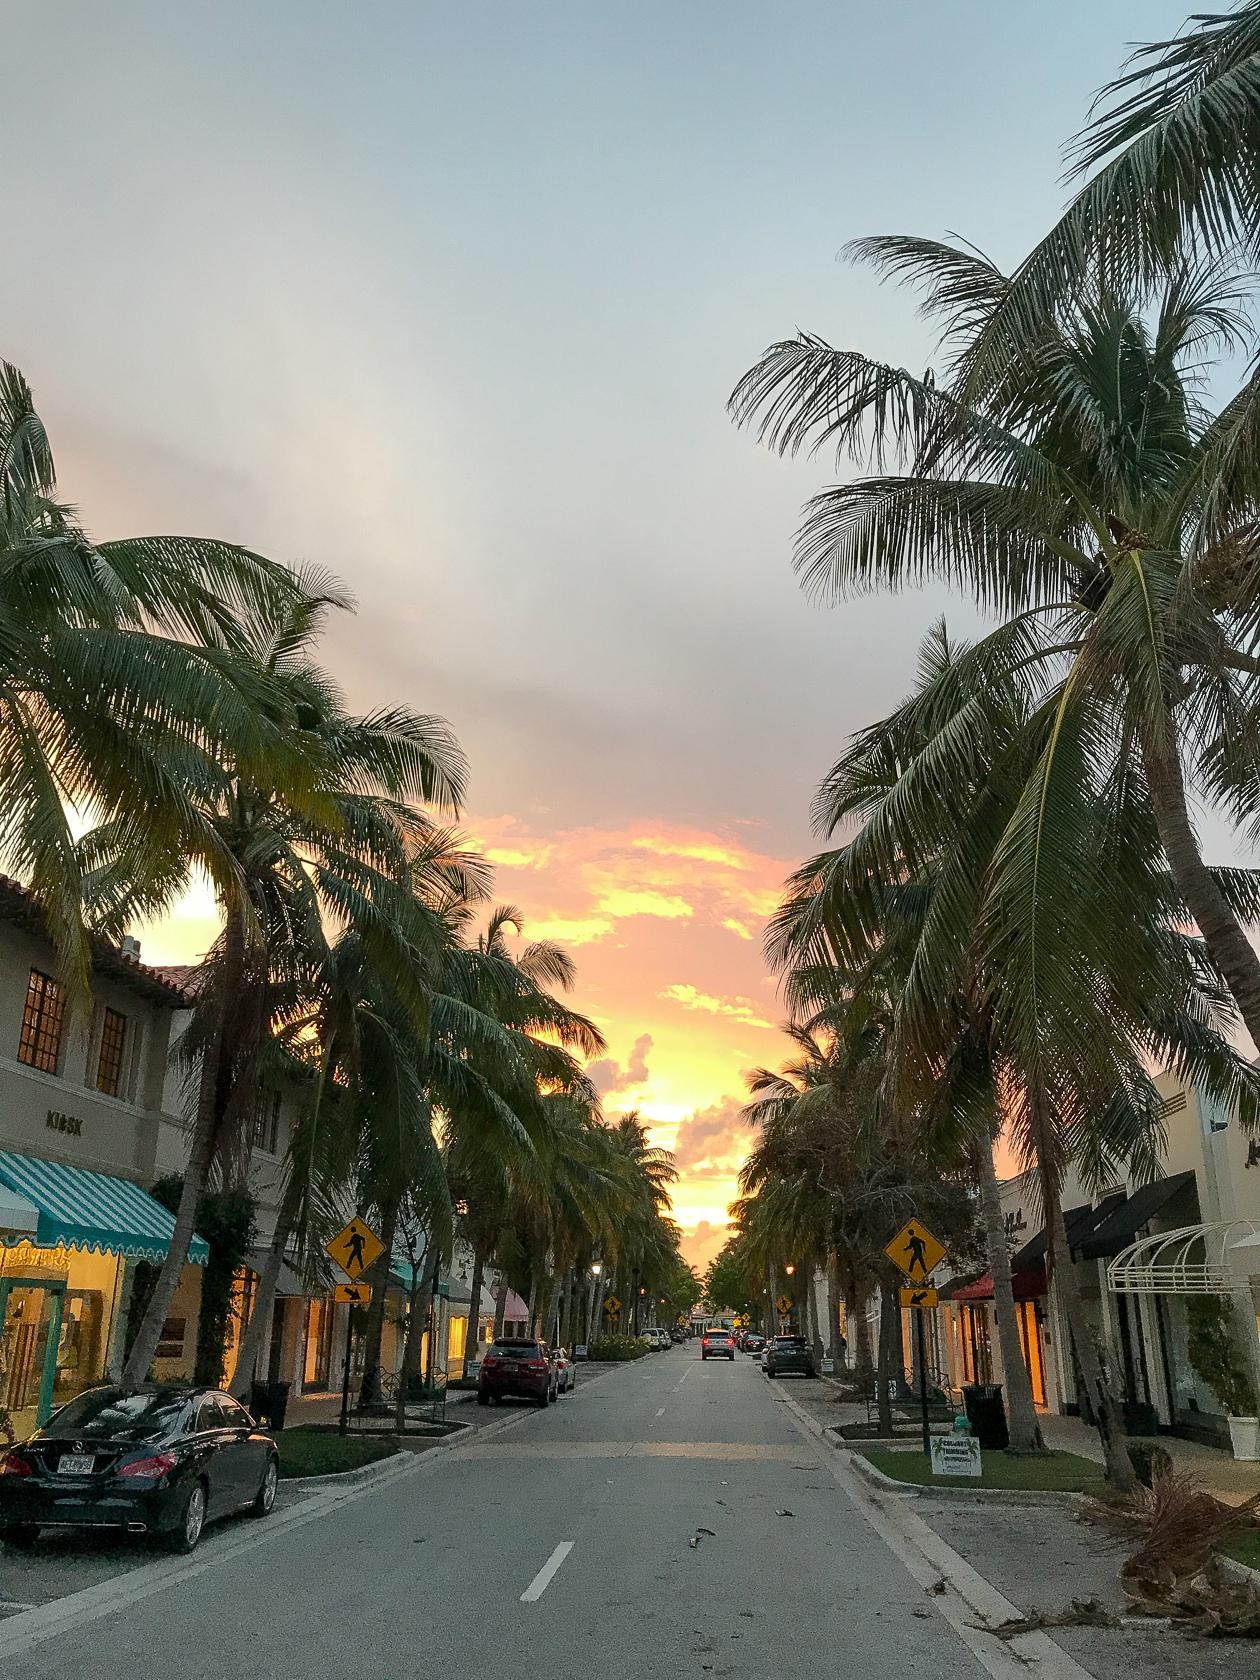 Sunset on Worth Ave.